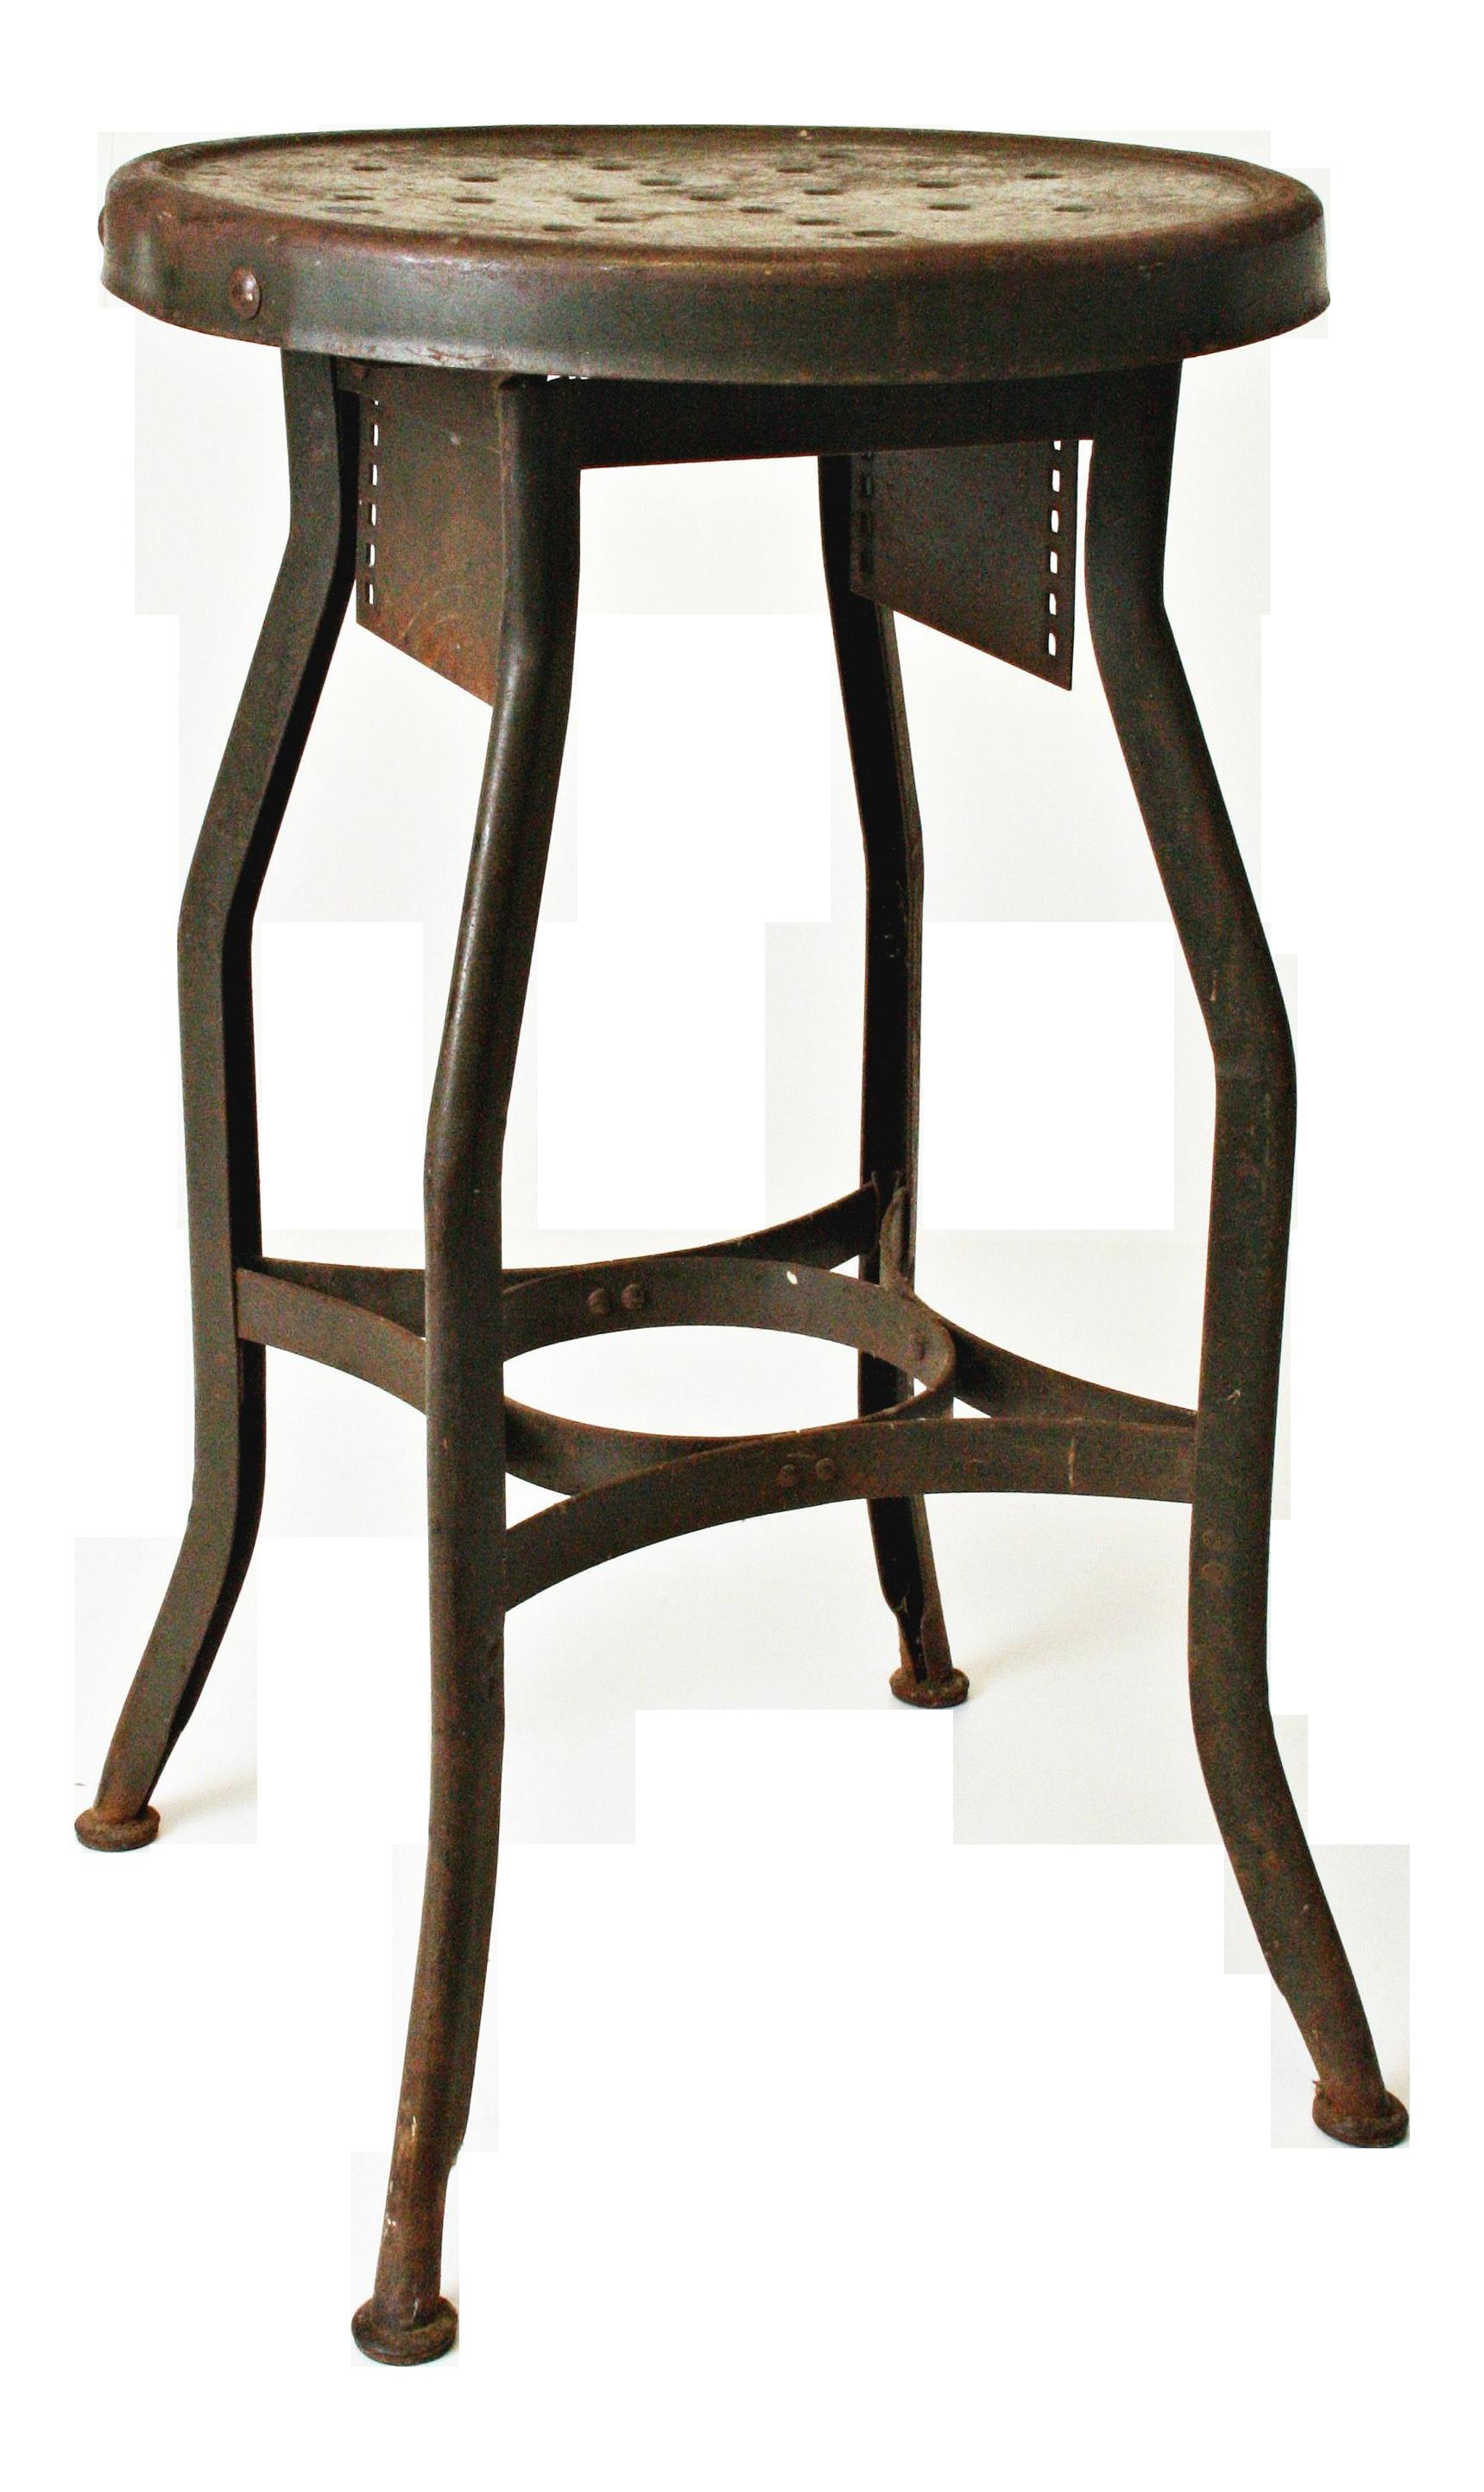 Vintage Industrial Metal Toledo Stool Chairish : eca12253 dfff 4ef4 9124 27628fbbeb51 from www.chairish.com size 1719 x 2886 png 3238kB